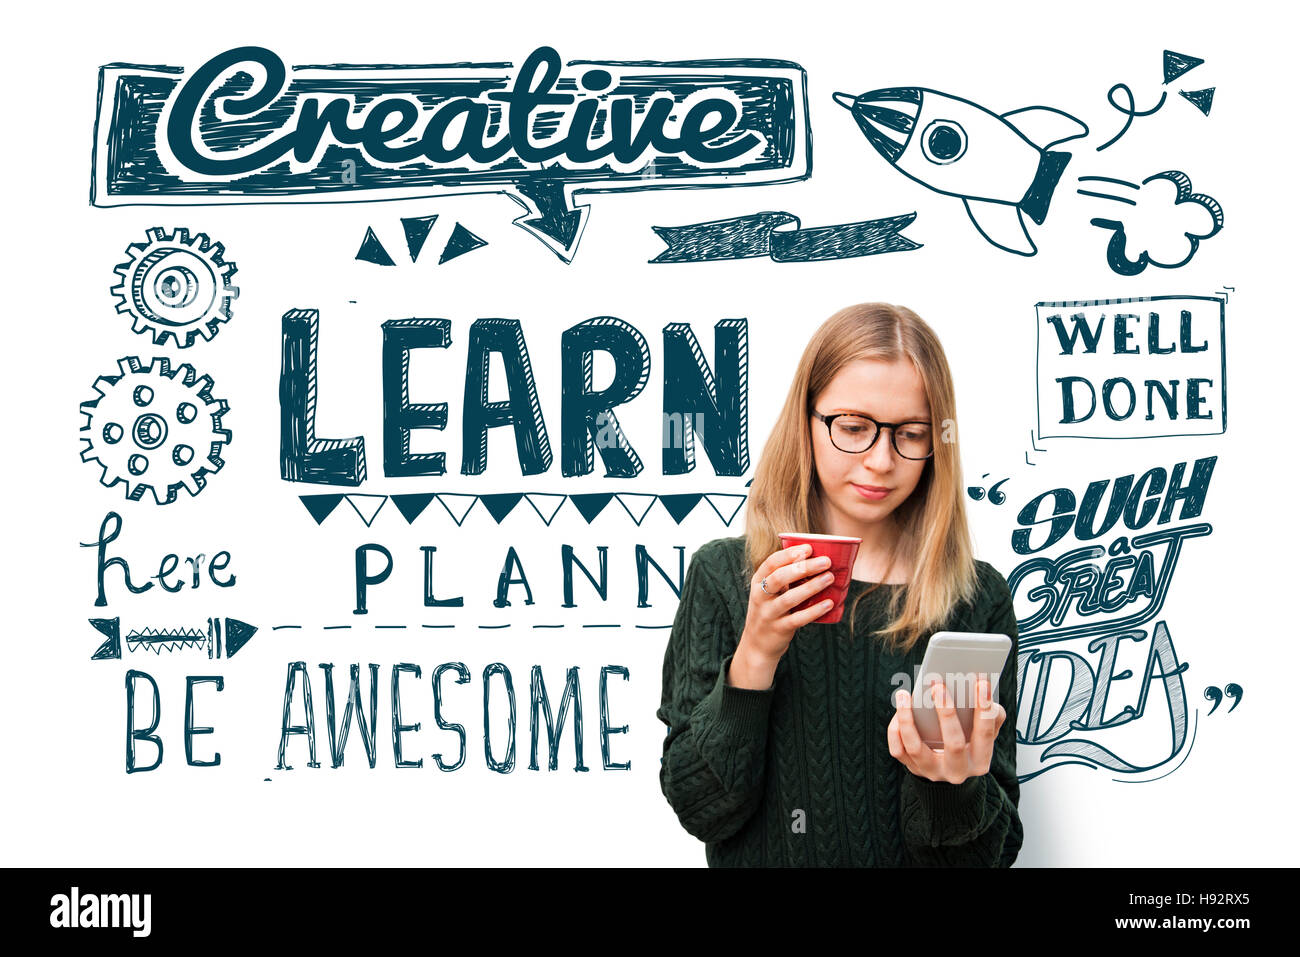 Learn Insight Education Knowledge Wisdom Ideas Concept - Stock Image